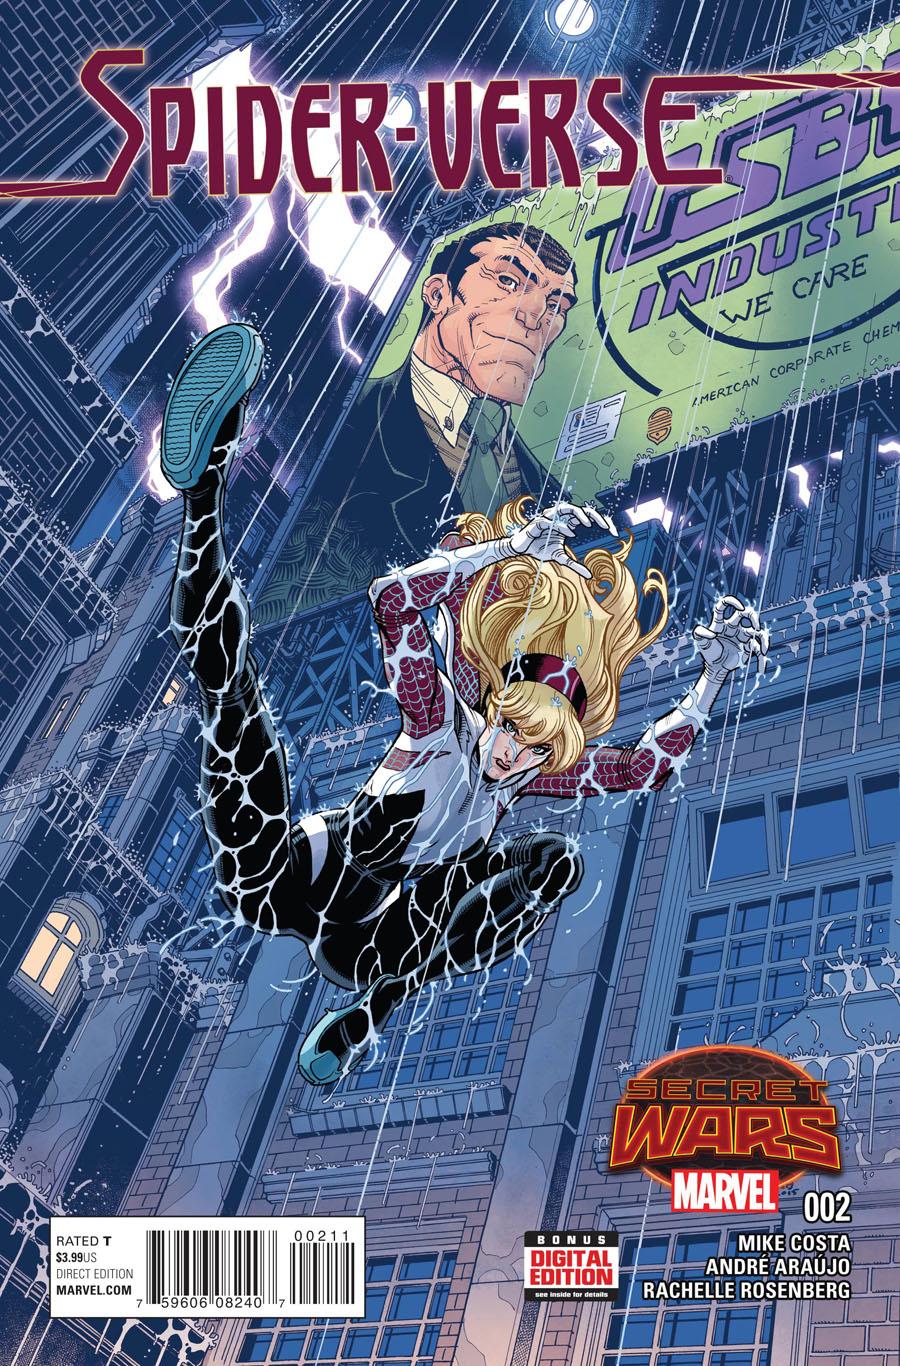 Spider-Verse Vol 2 #2 Cover A Regular Nick Bradshaw Cover (Secret Wars Warzones Tie-In)